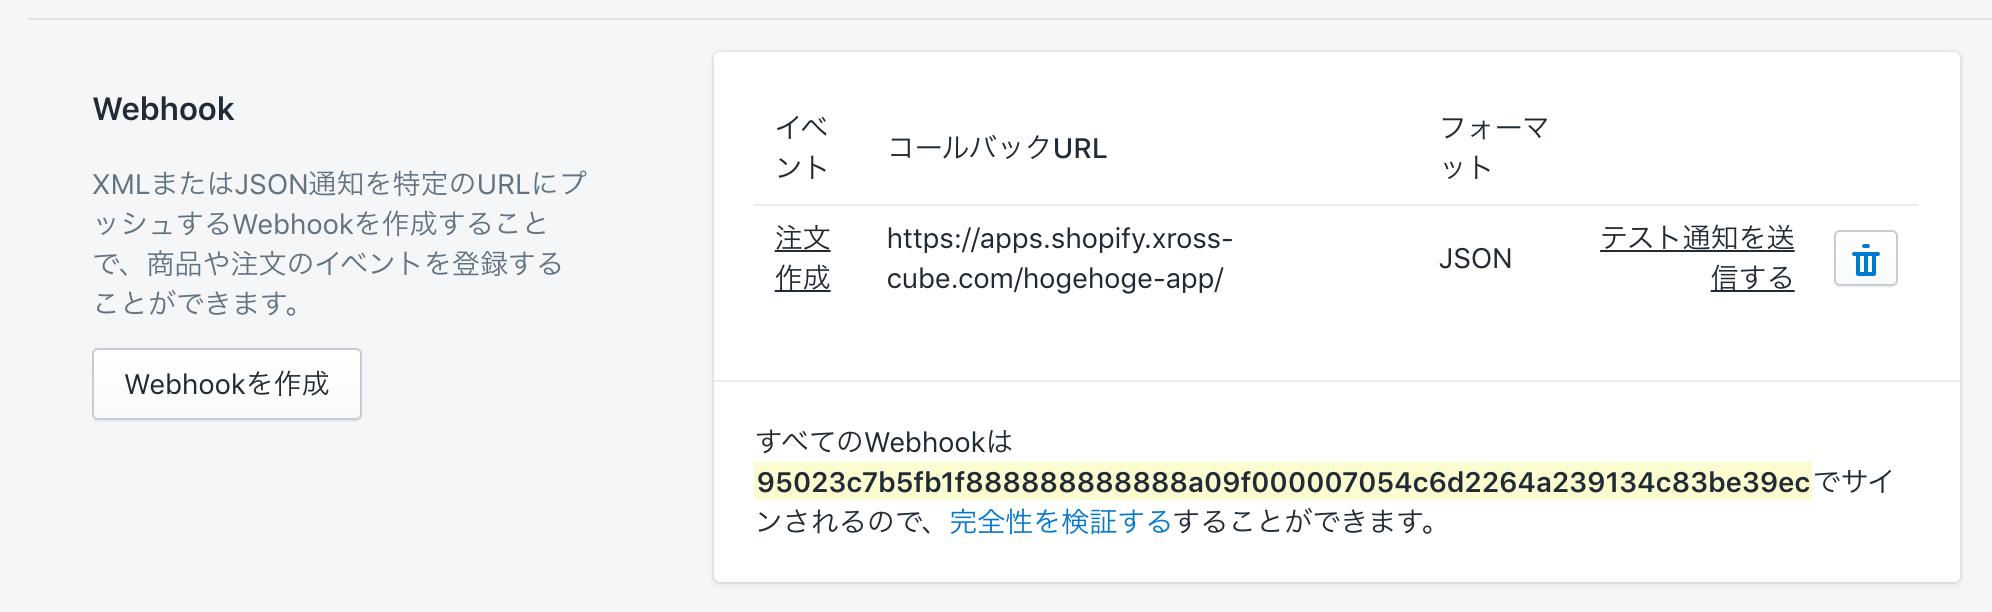 Shopify Admin Setting 通知メニュー